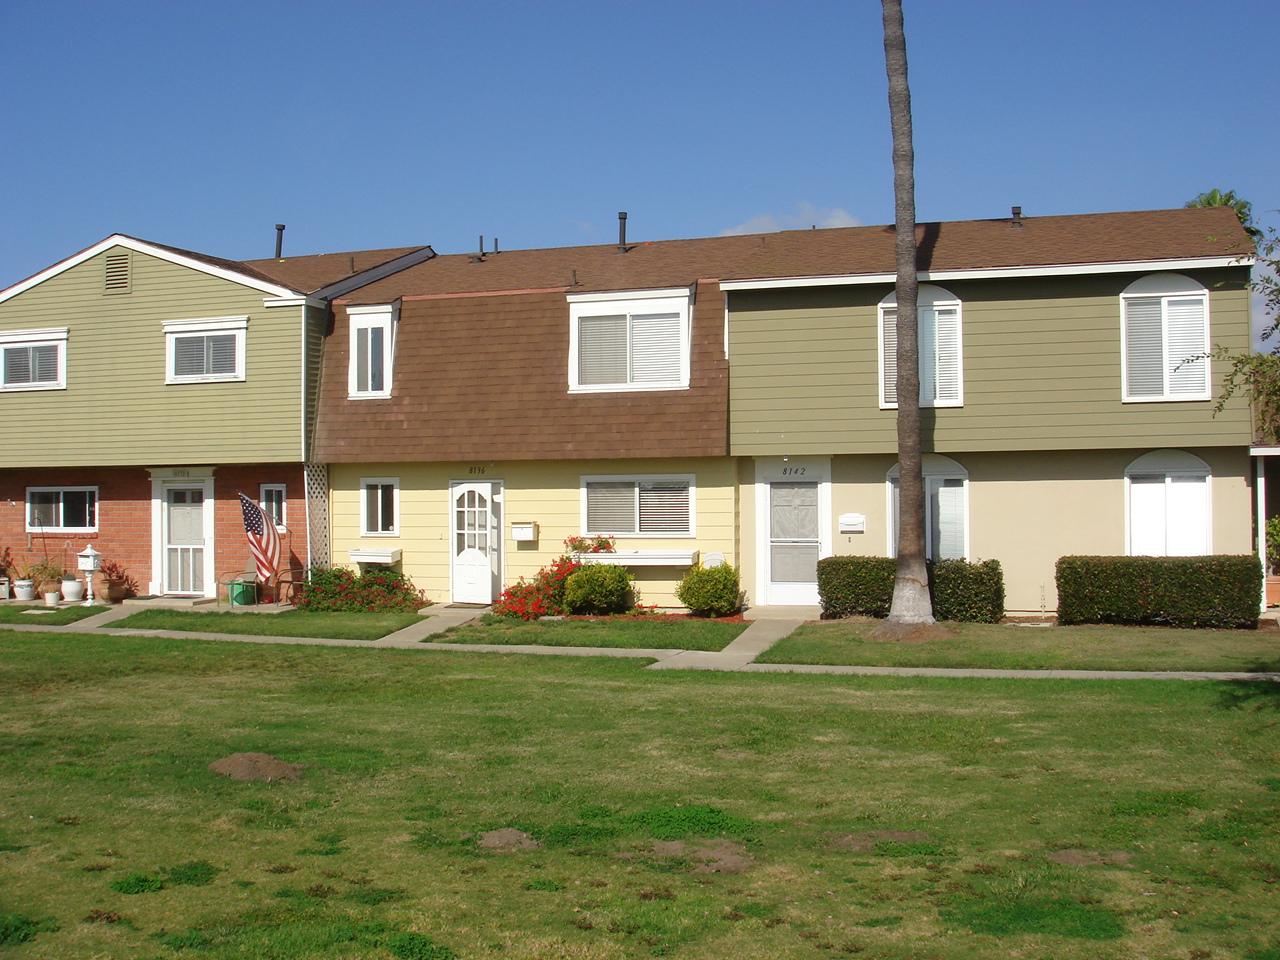 Surfside Homes by the Sea Huntington Beach